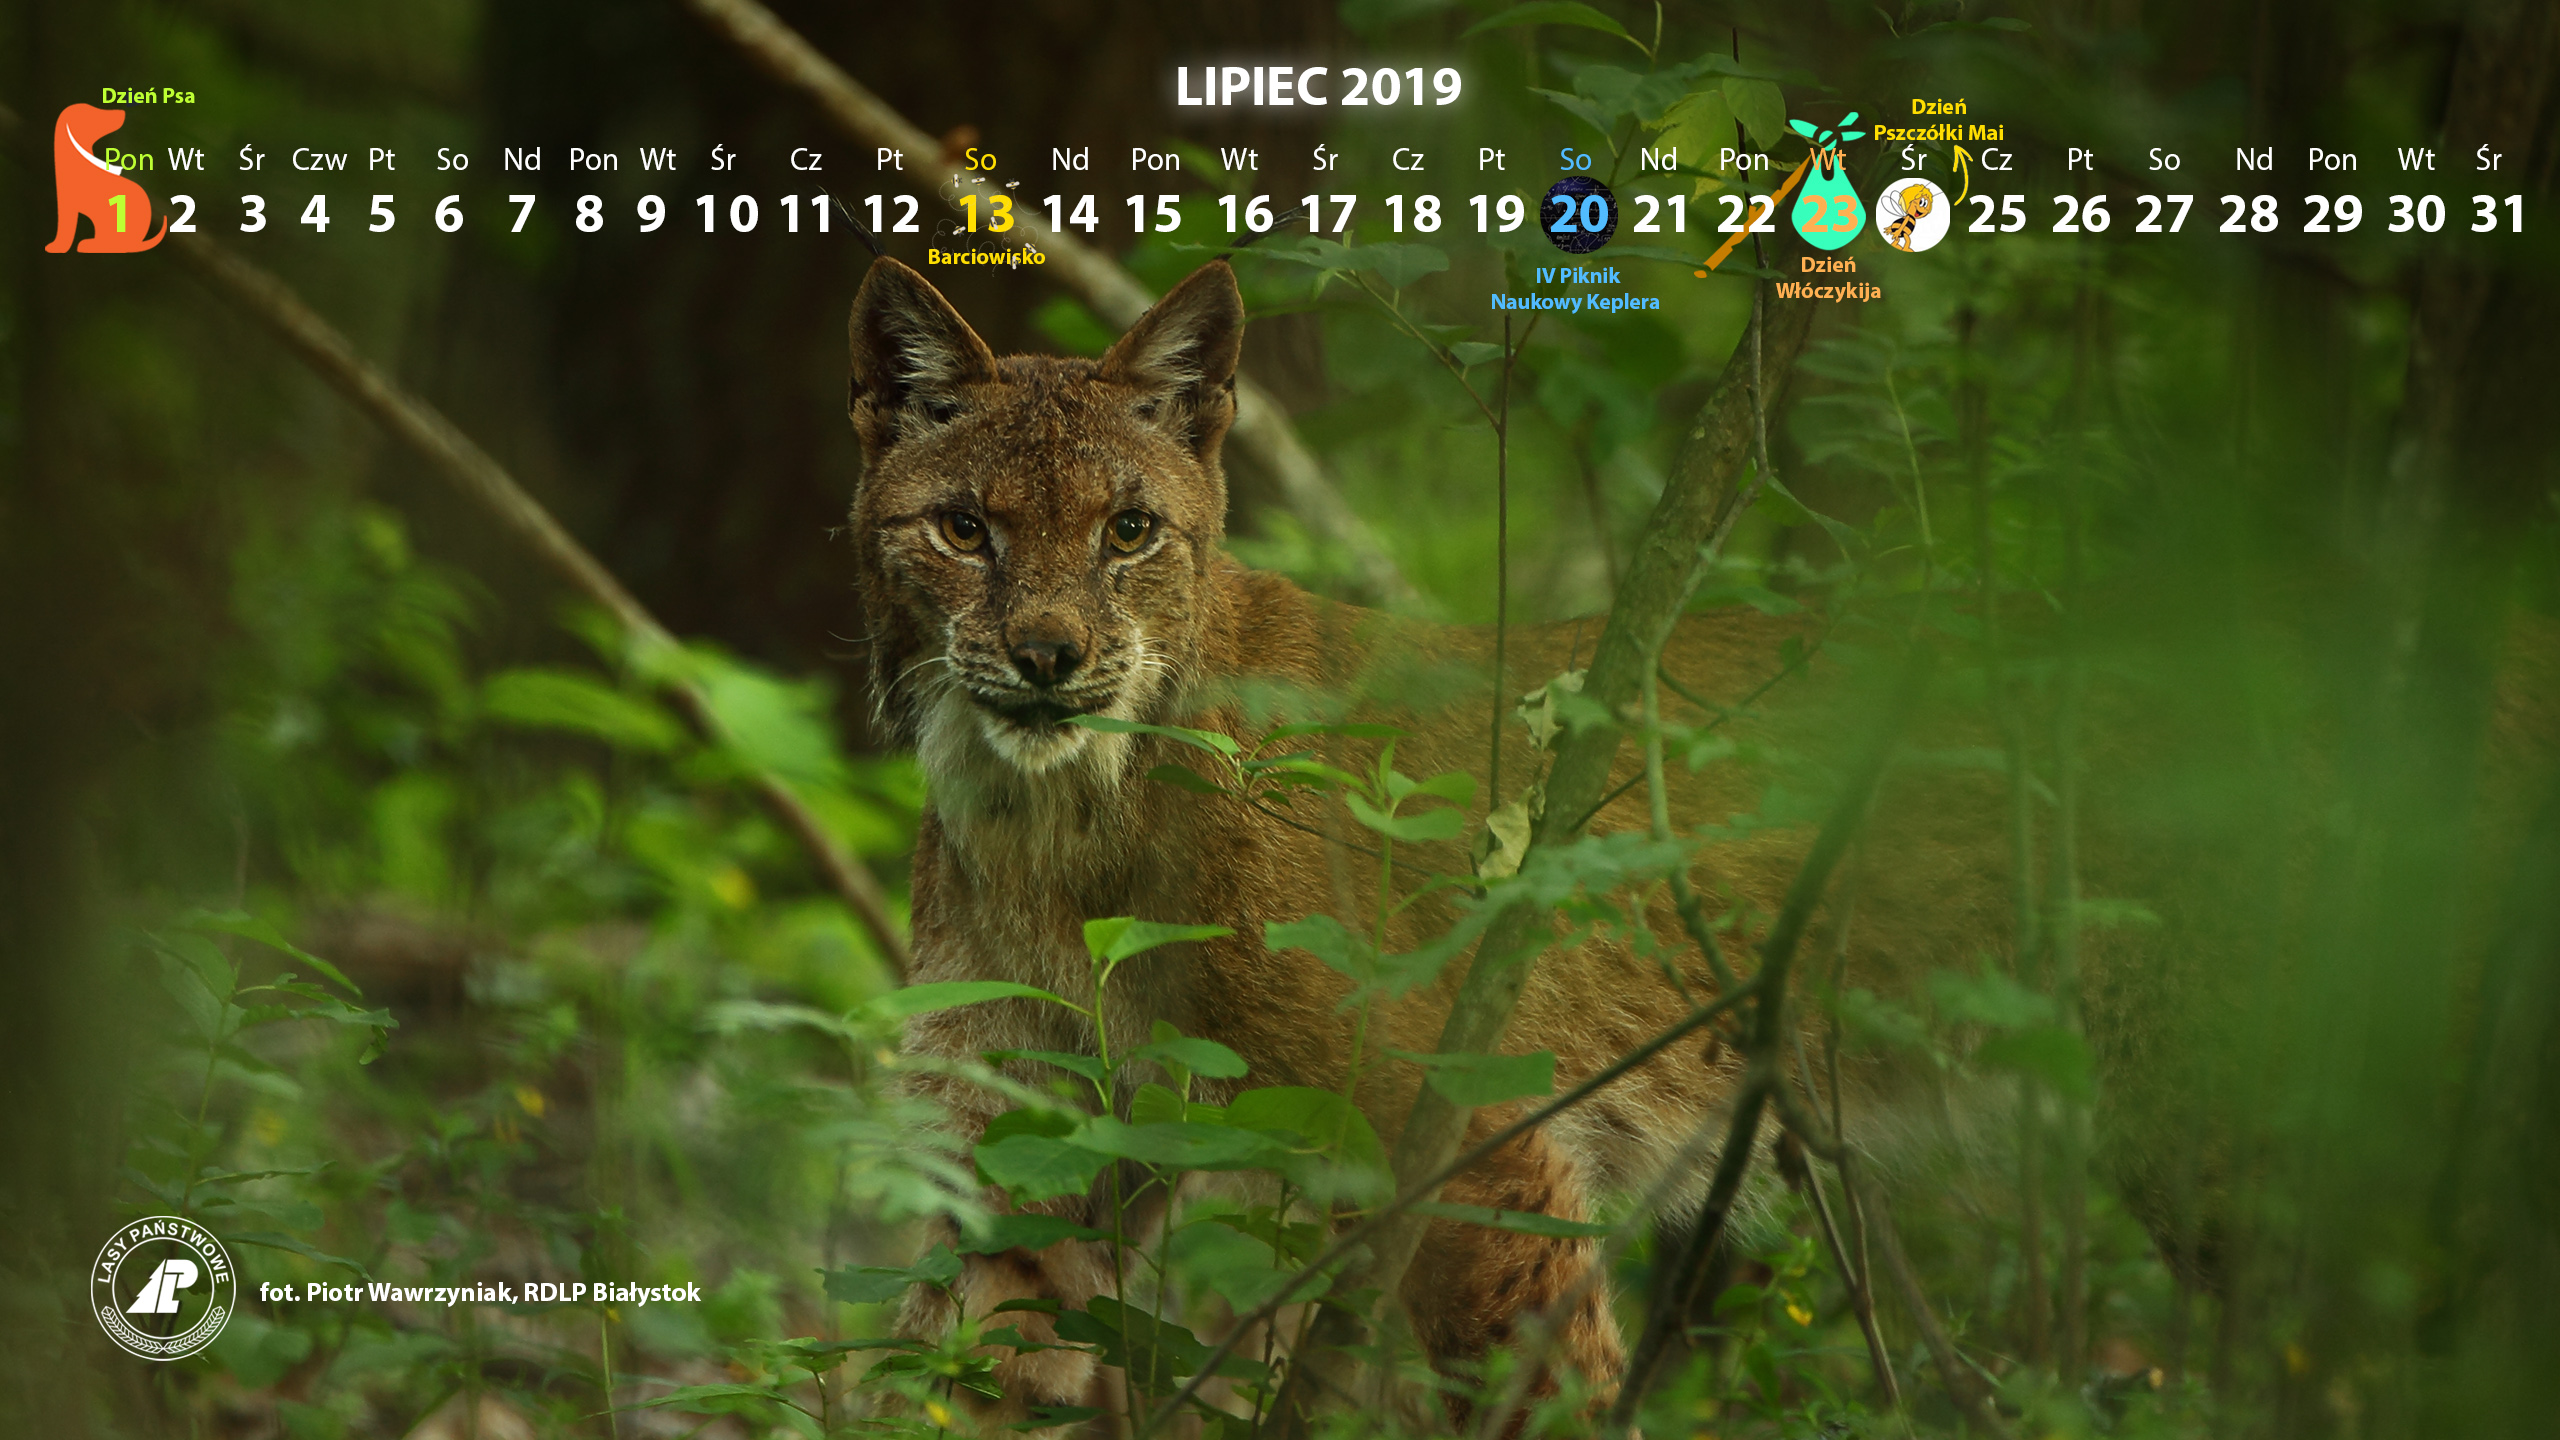 Kalendarz_lipiec2019_2560x1440[1].jpg